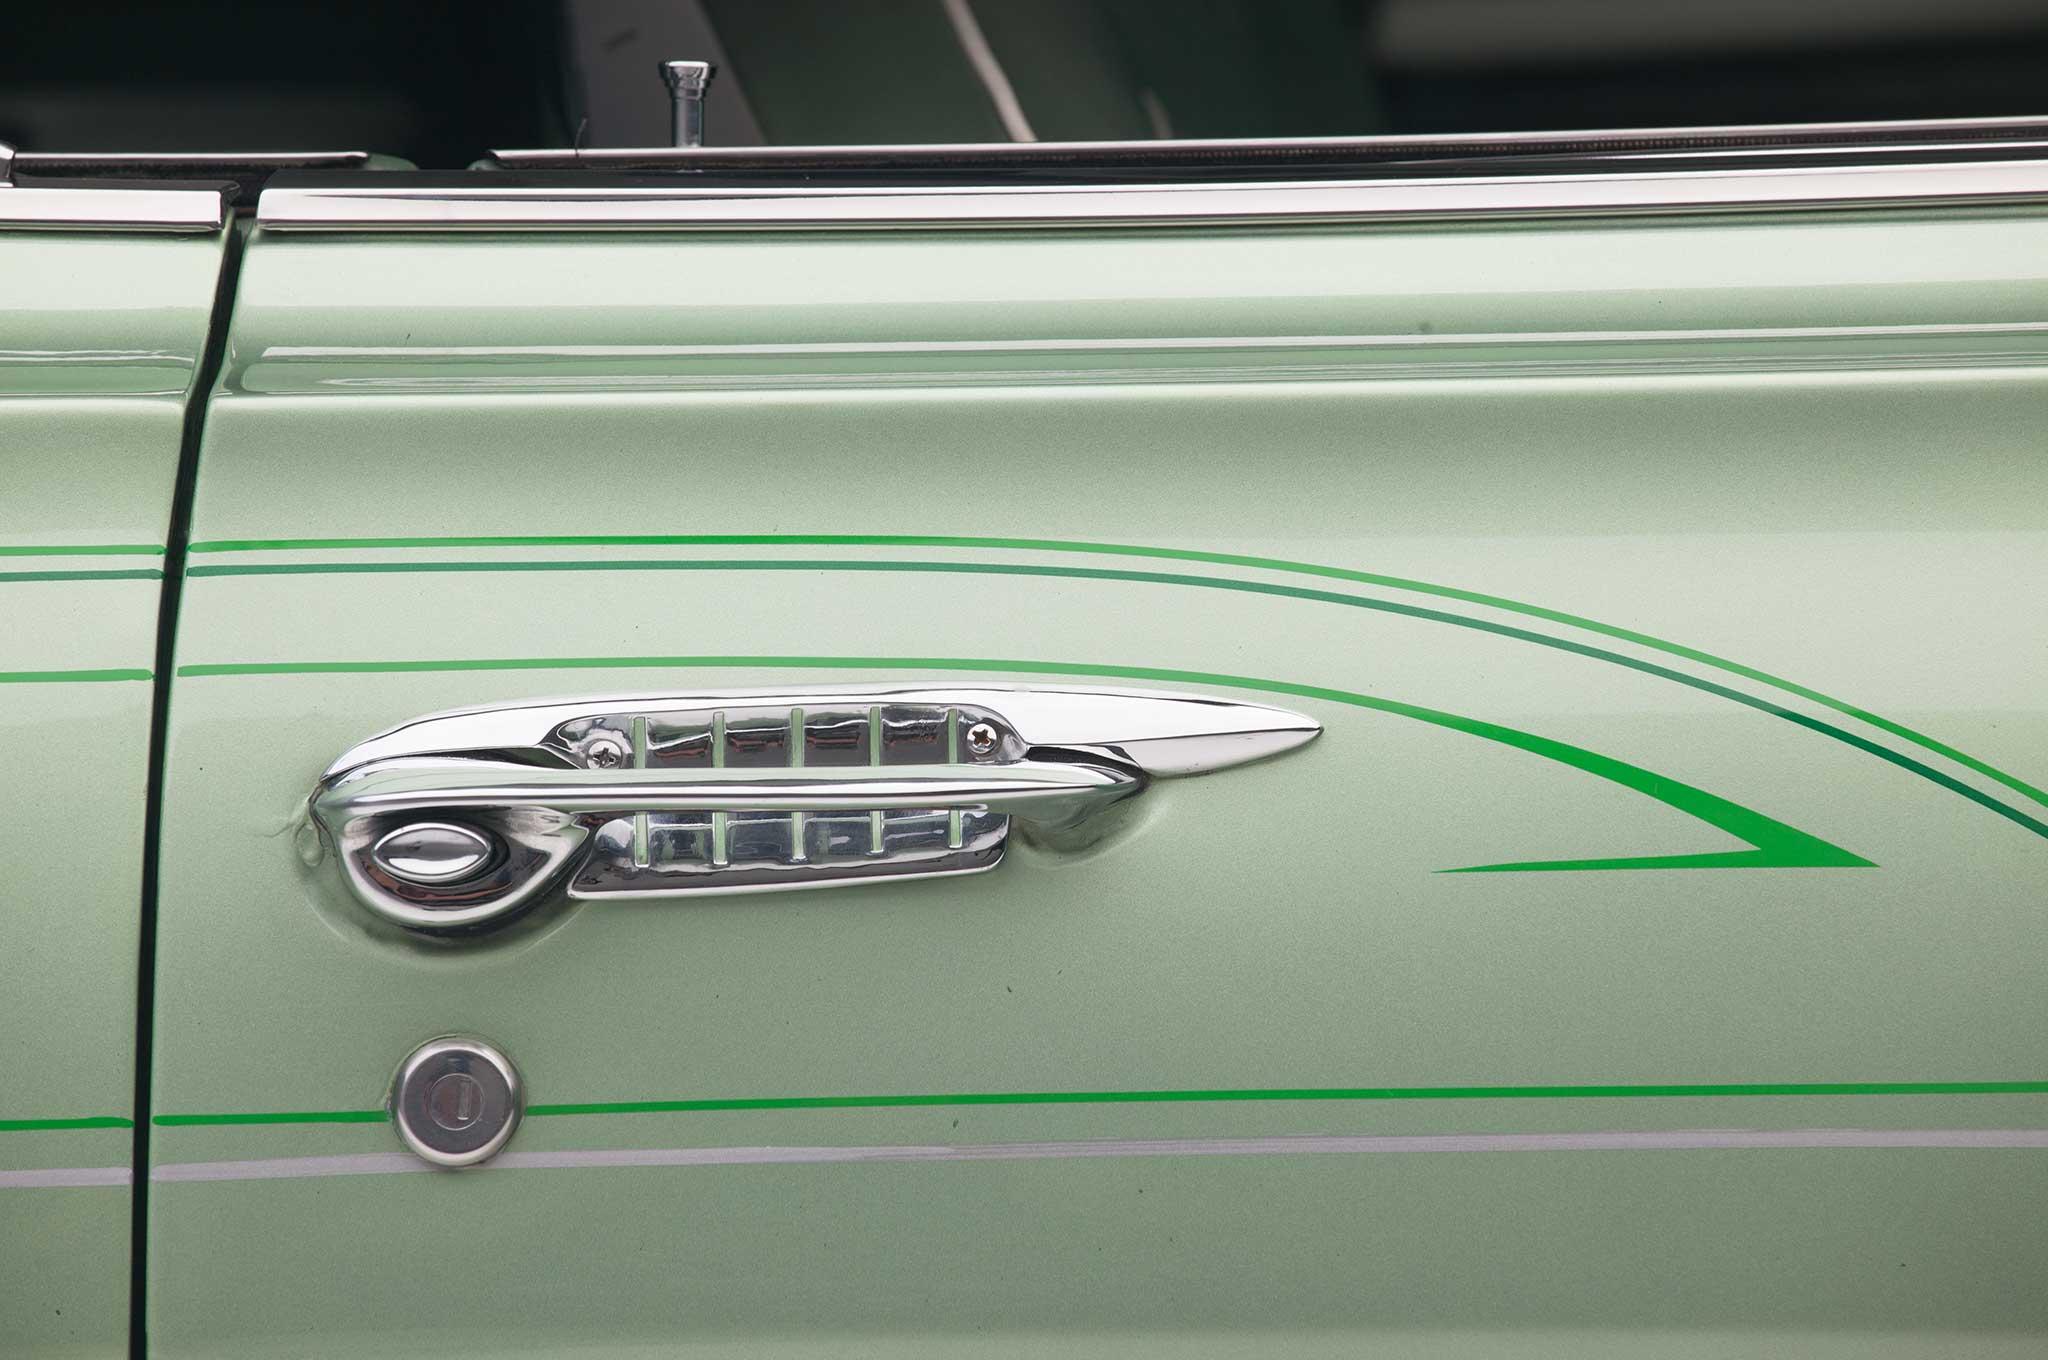 1963 Chevrolet Impala Man Overboard